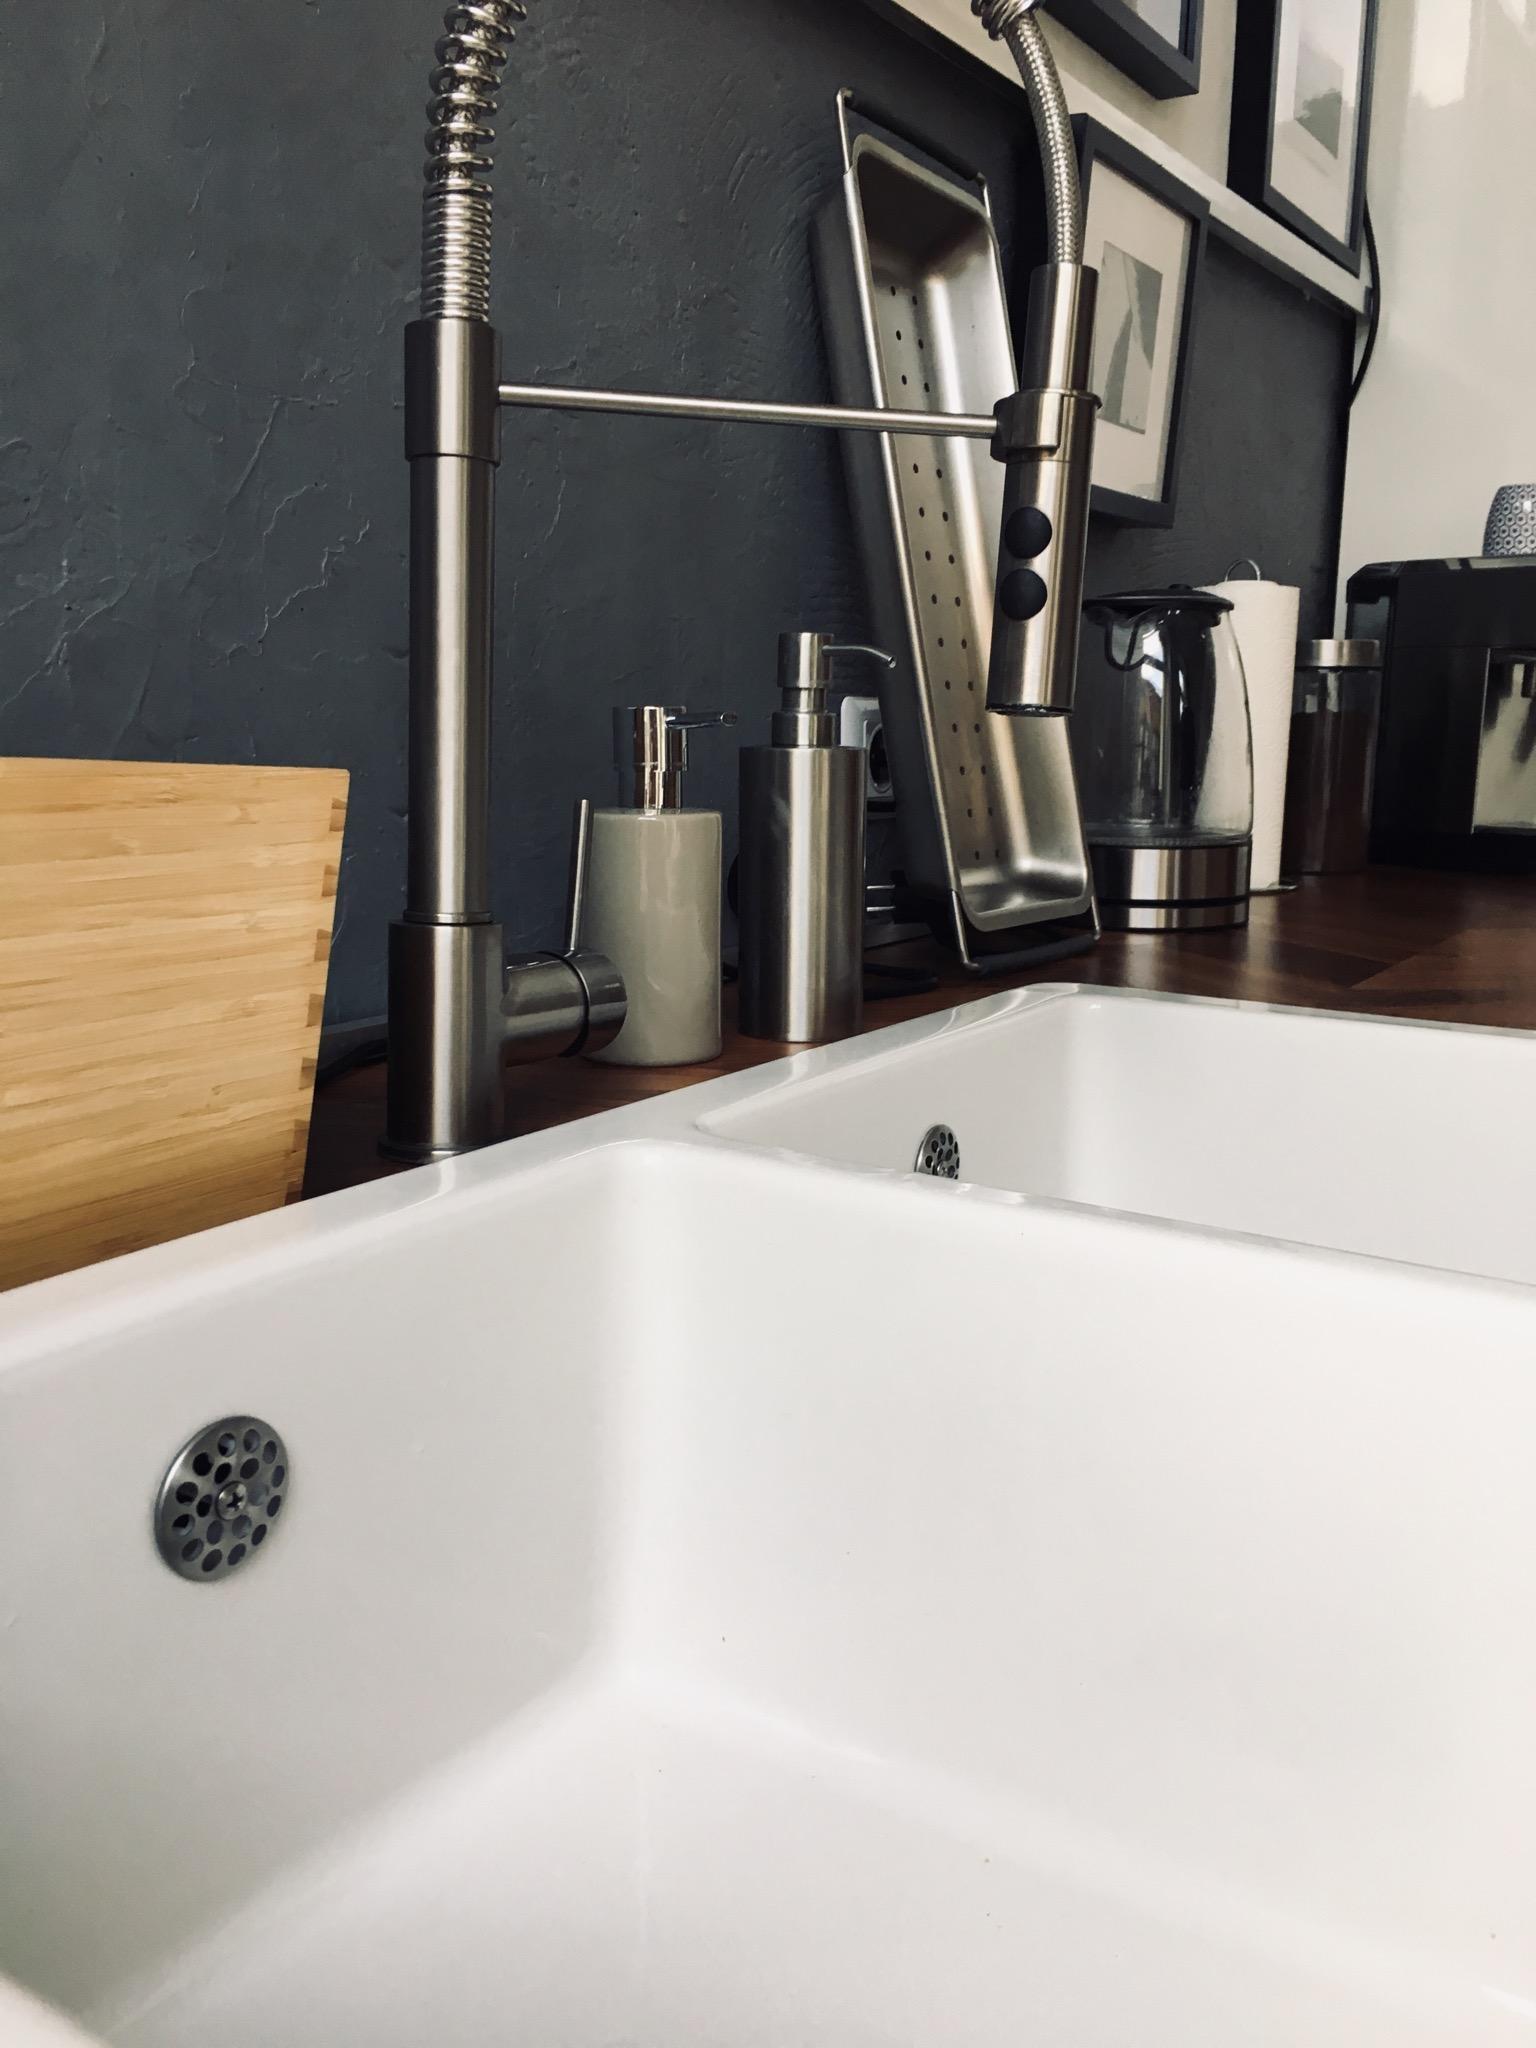 Full Size of Küche Waschbecken Abfluss Küche Waschbecken Abfluss Verstopft Wohnmobil Küche Waschbecken Küche Waschbecken Edelstahl Küche Küche Waschbecken